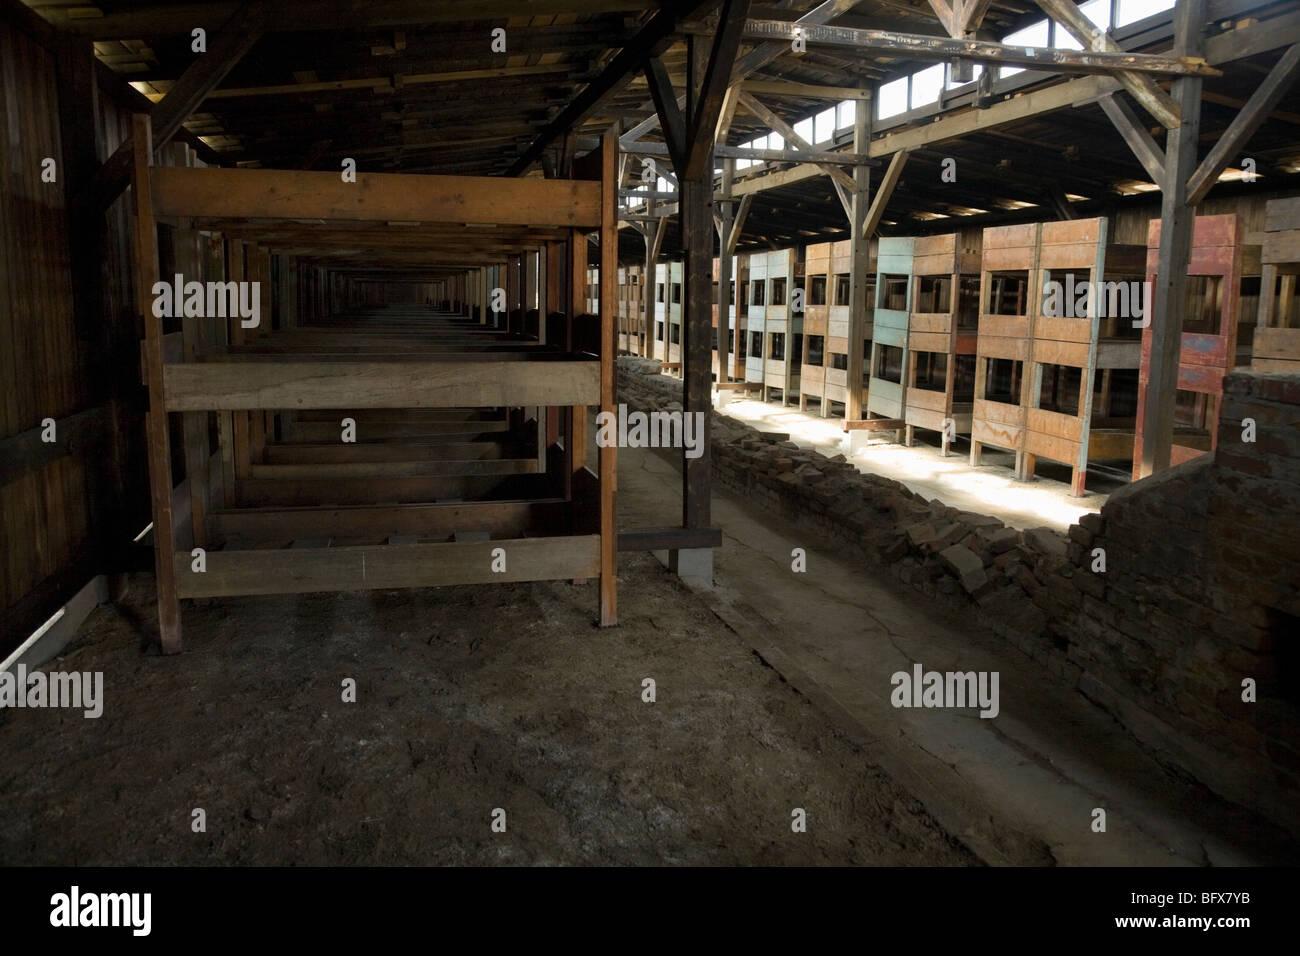 Inside a hut / shed – with bunks for prisoners – of the Birkenau (Auschwitz II - Birkenau) Nazi death camp in Oswiecim, - Stock Image